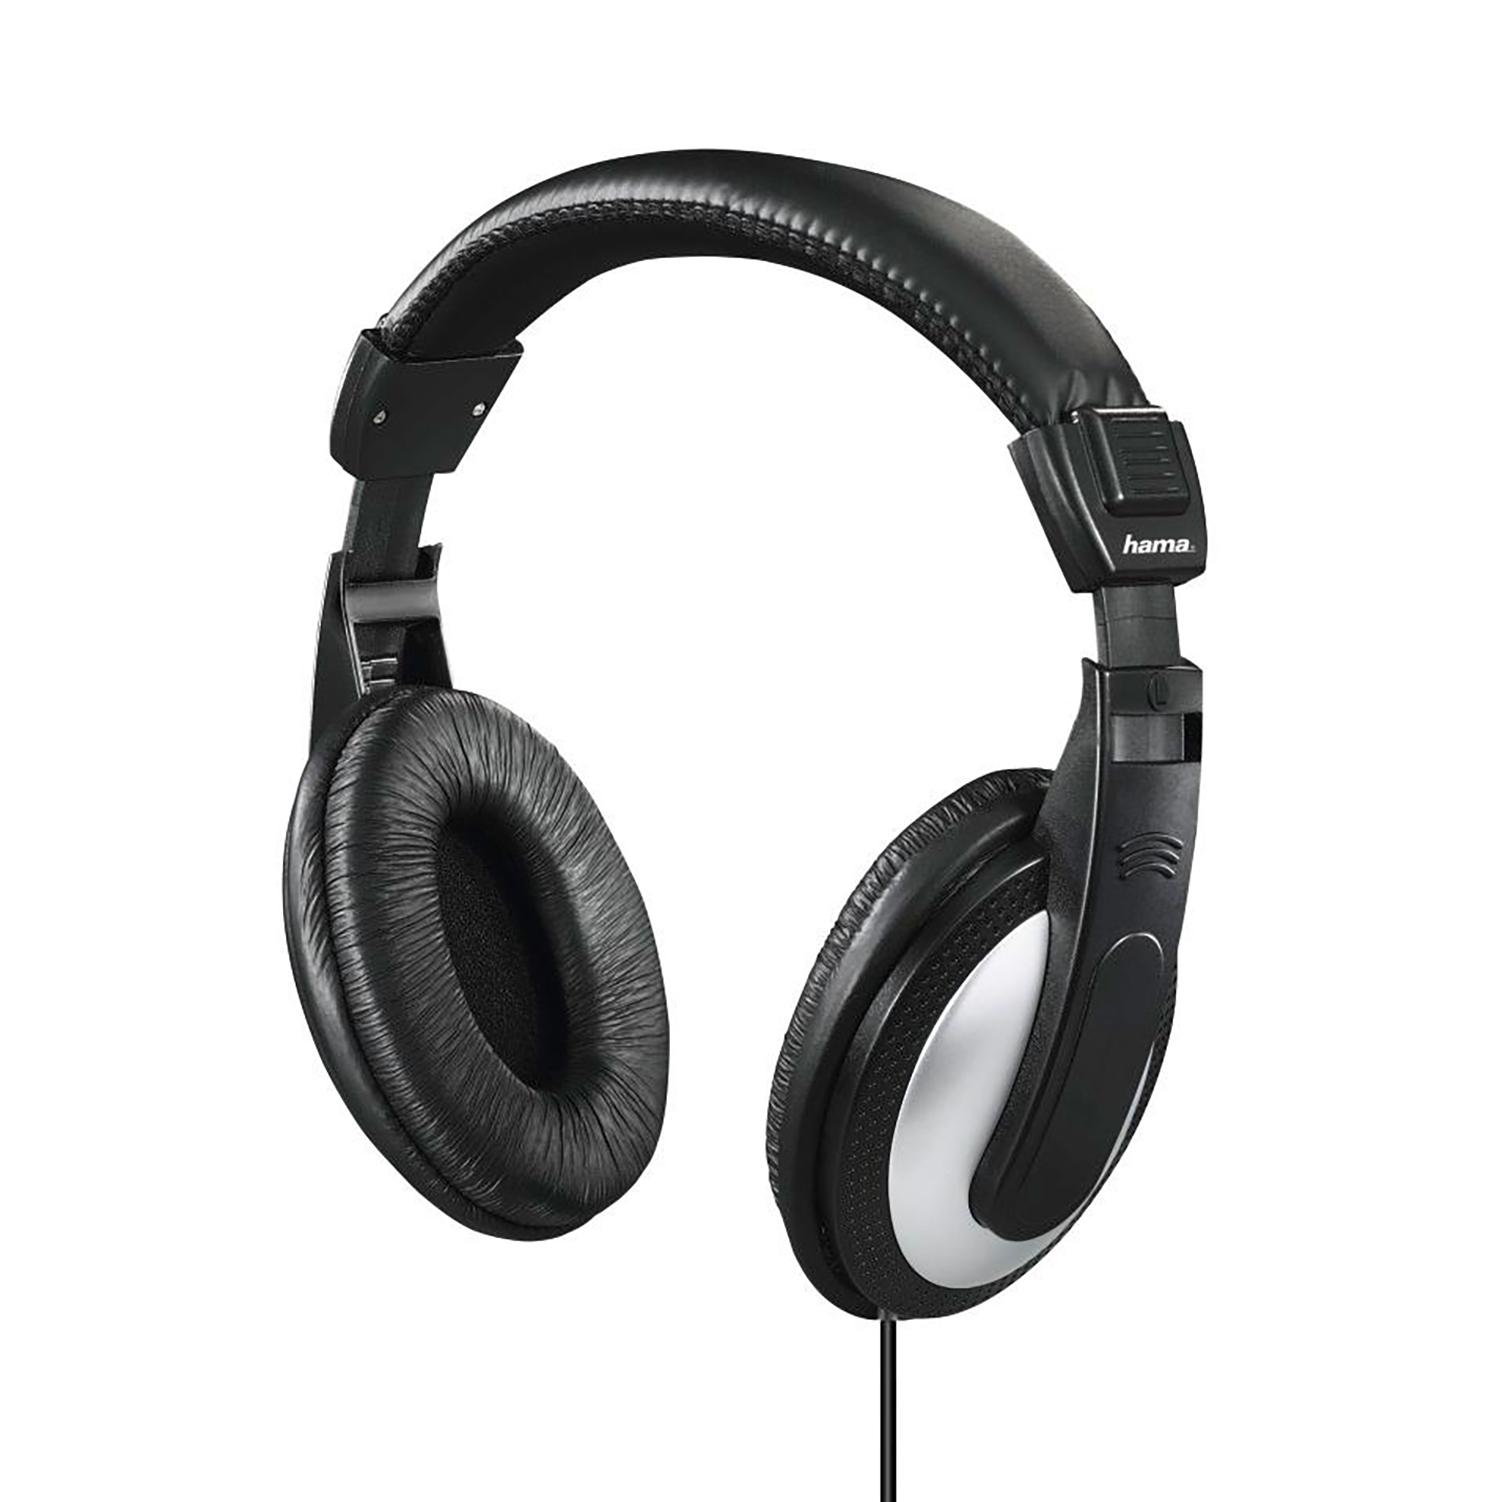 Hama Headphones Padded Over-Ear Circumaural Stereo 6m Cable Black Ref 00135619